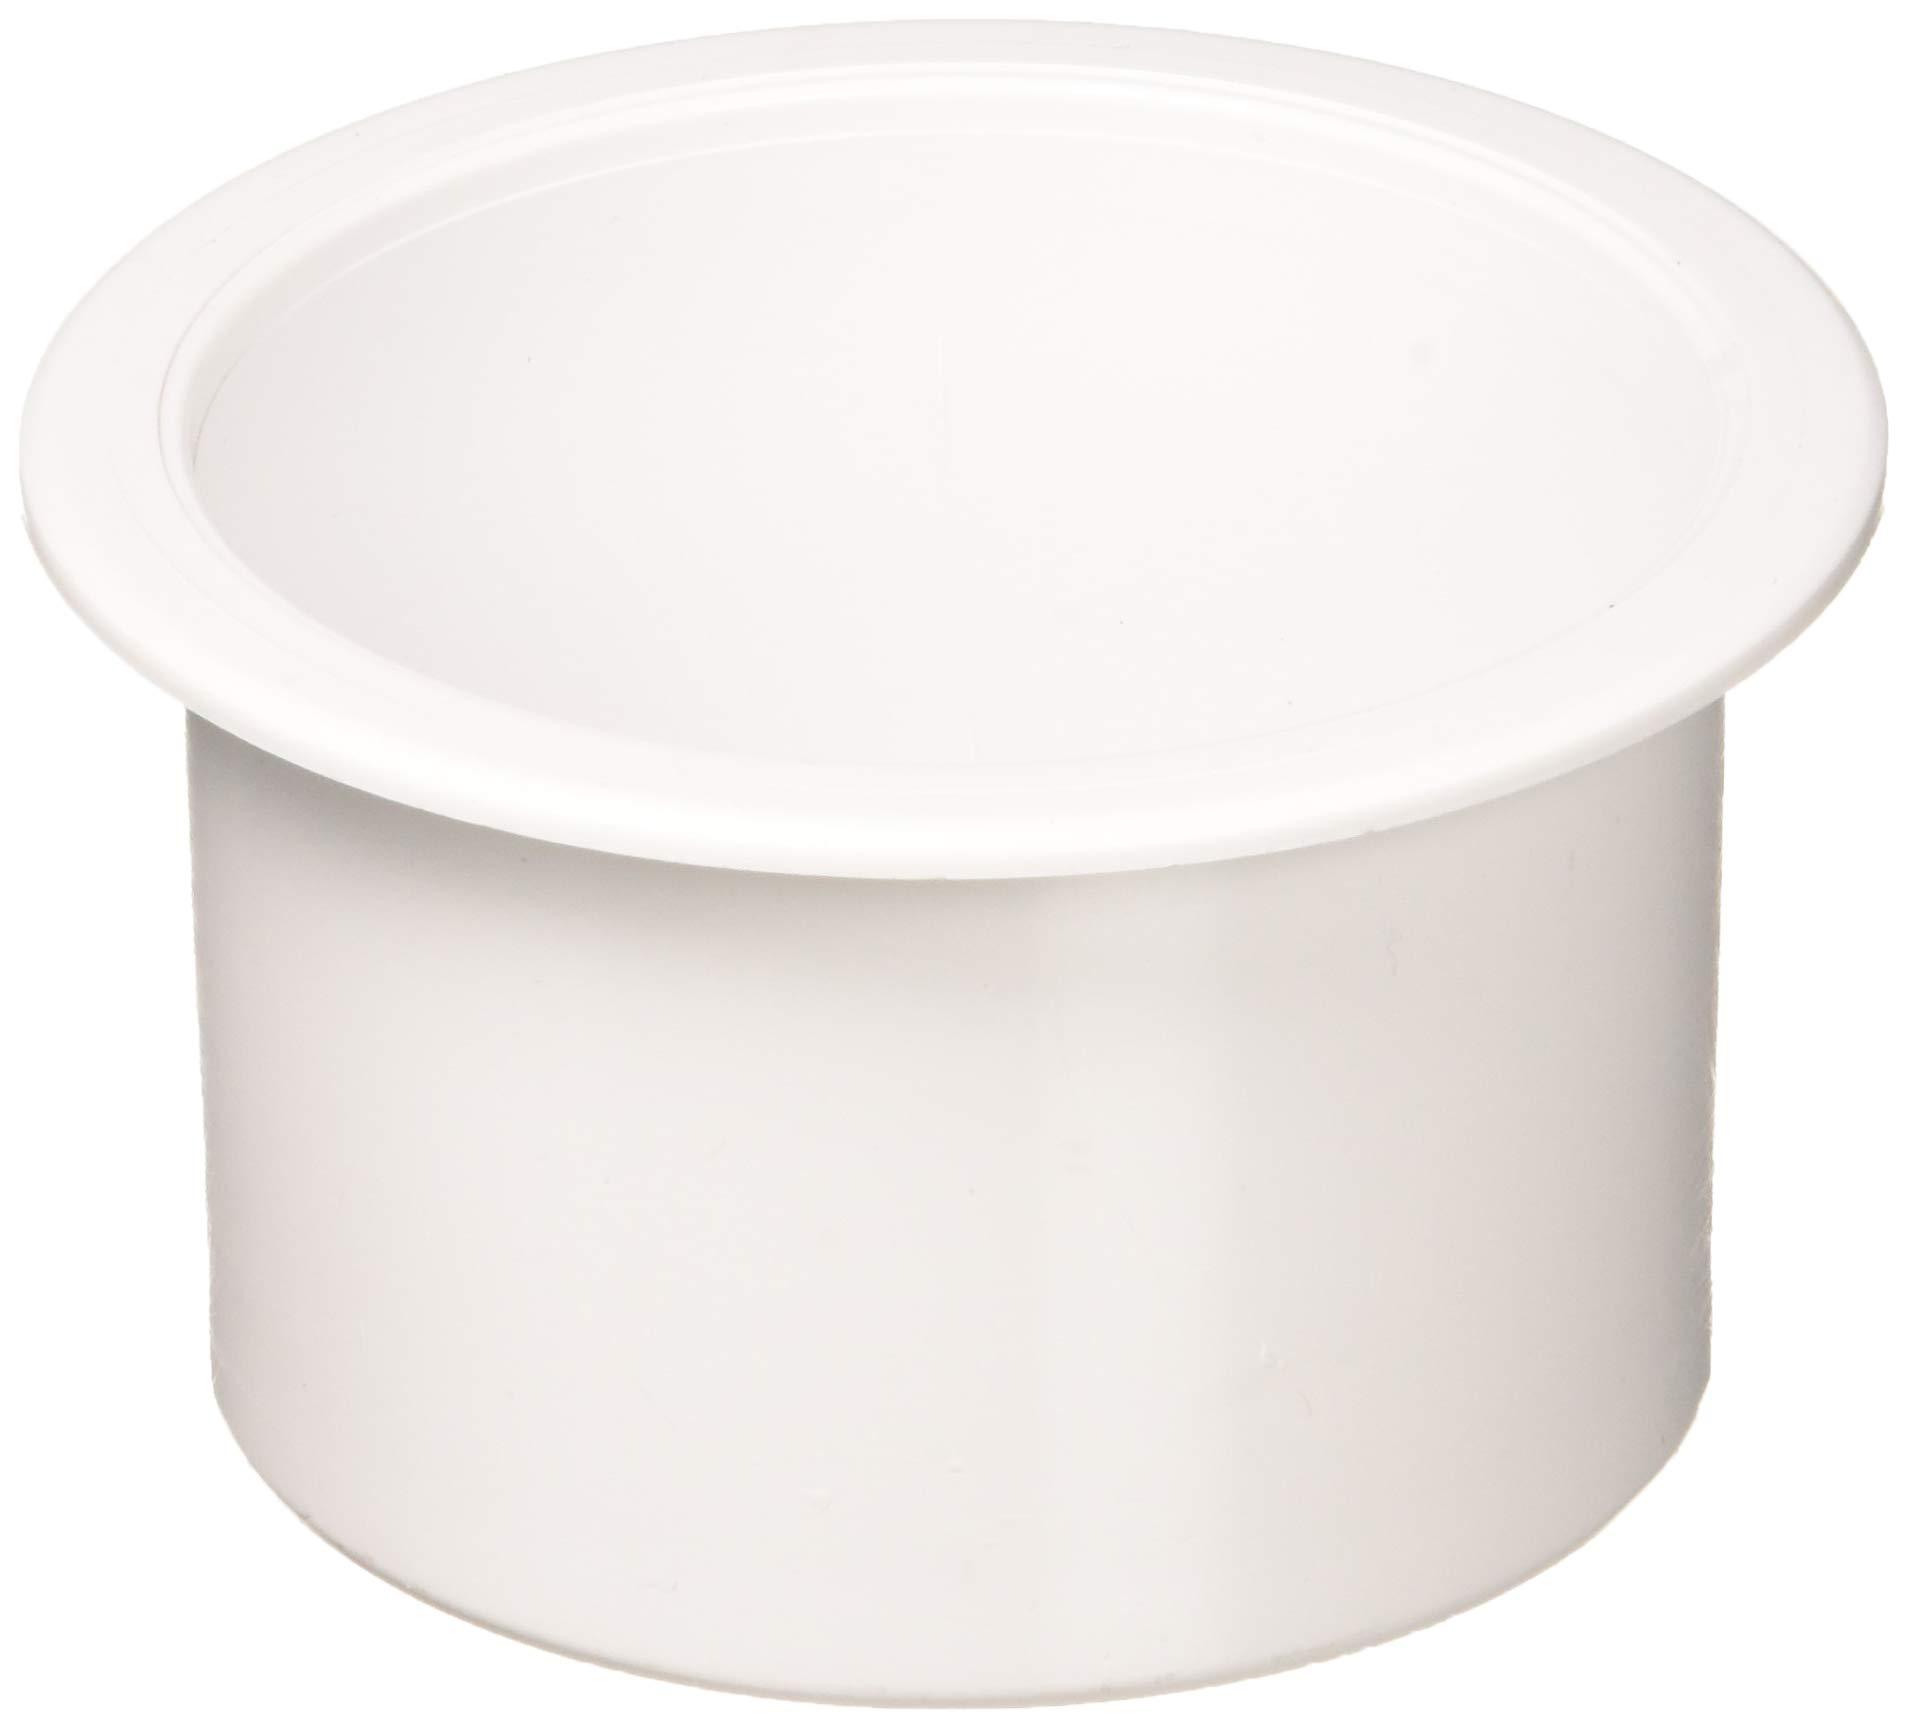 Sea-Dog 588001 Flush Mount Drink Holder, 2'' Deep - White